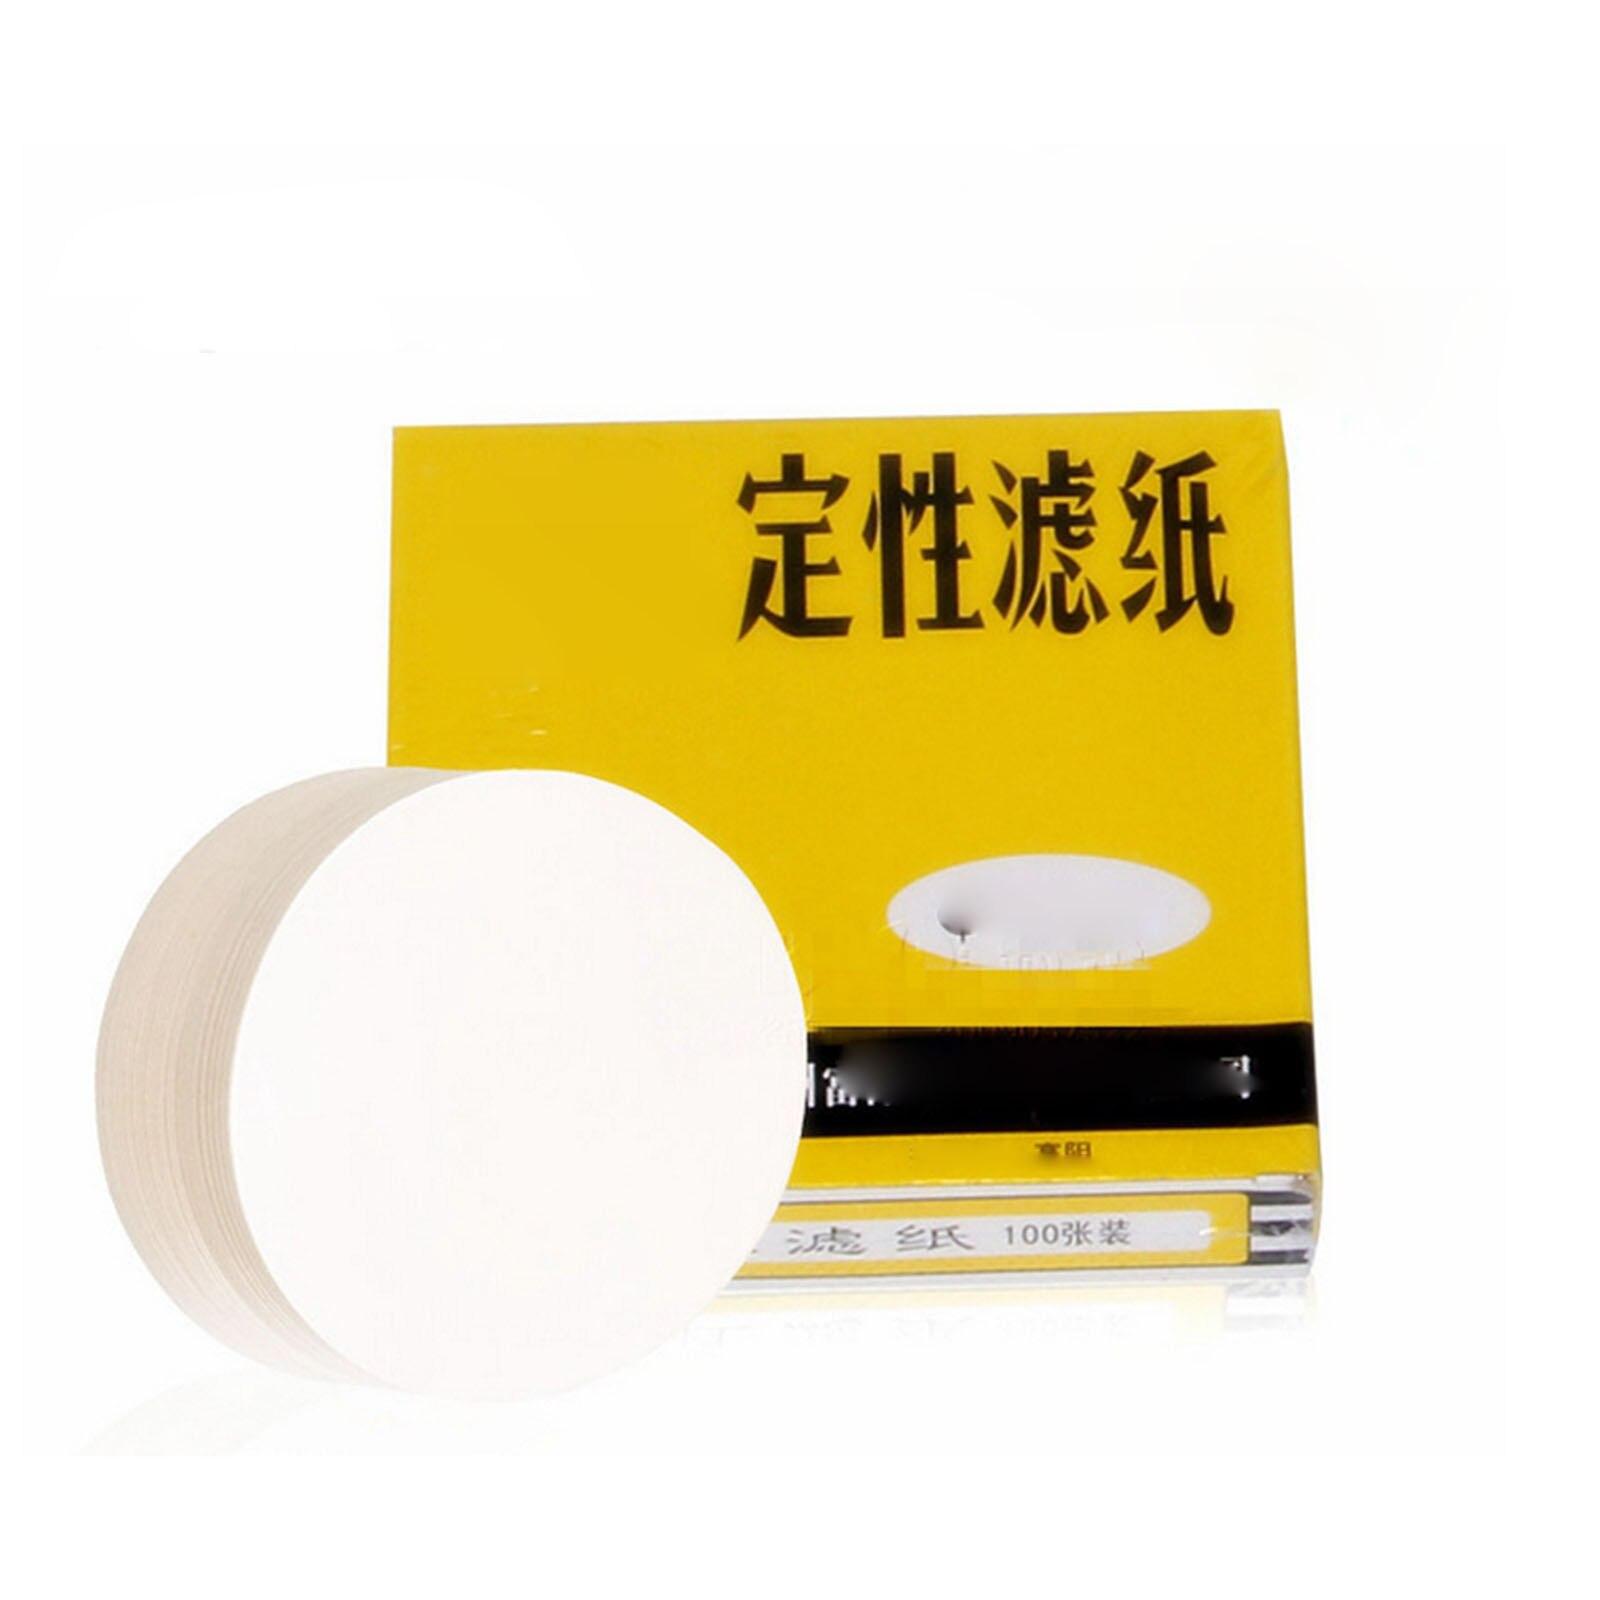 Lot100 A Box Circles 18cm Diameter 10-15/15-20/20-25 Micron Ashless Qualitative Filter Paper